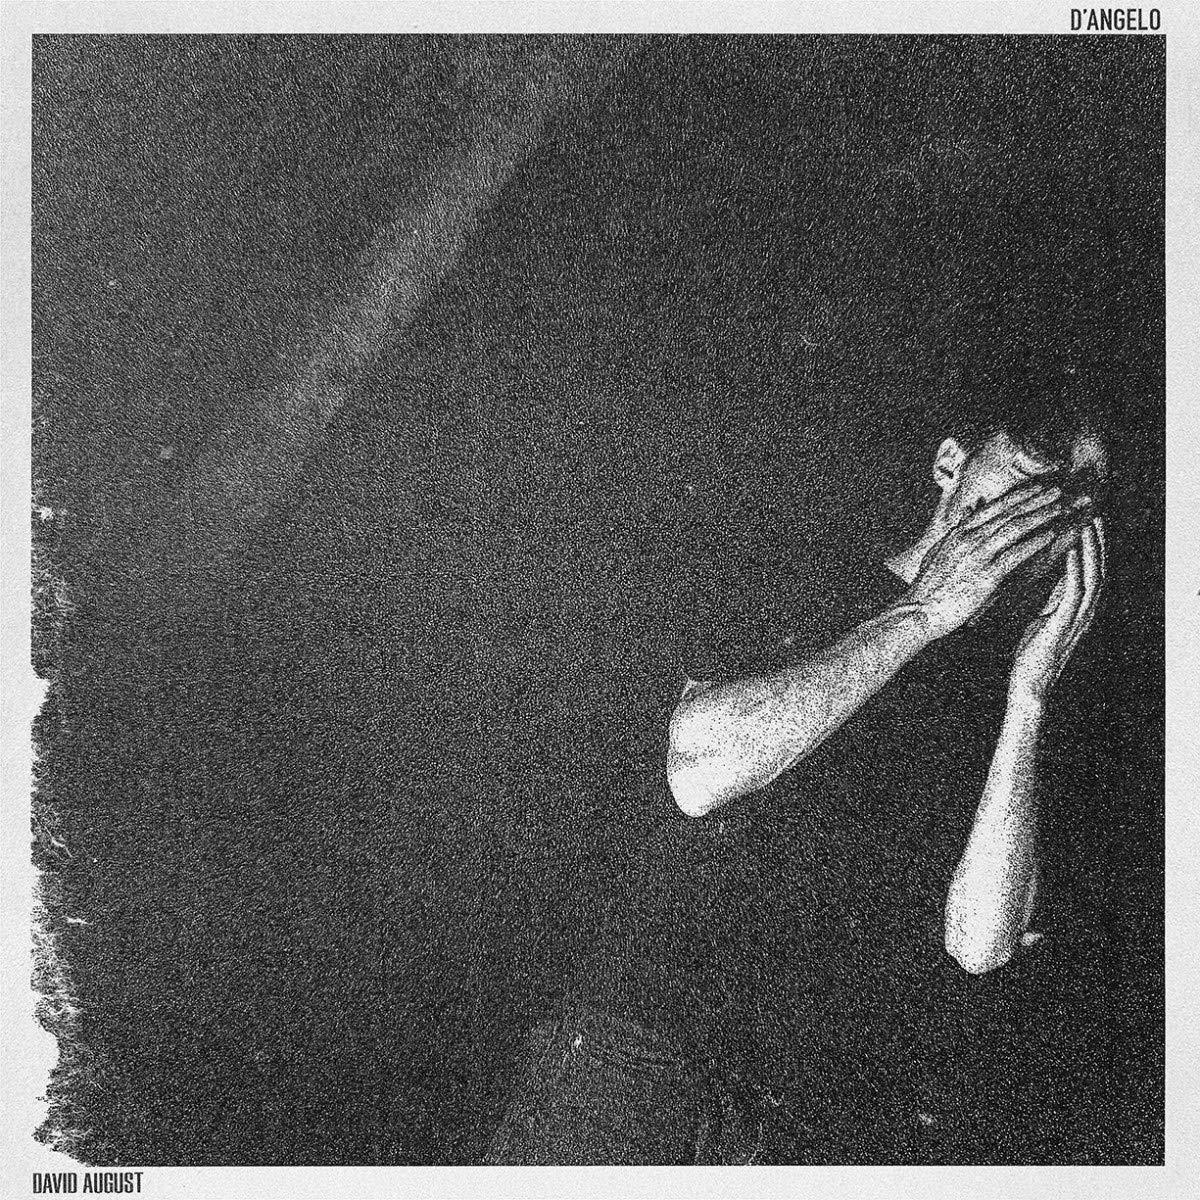 CD : David August - D'angelo (CD)